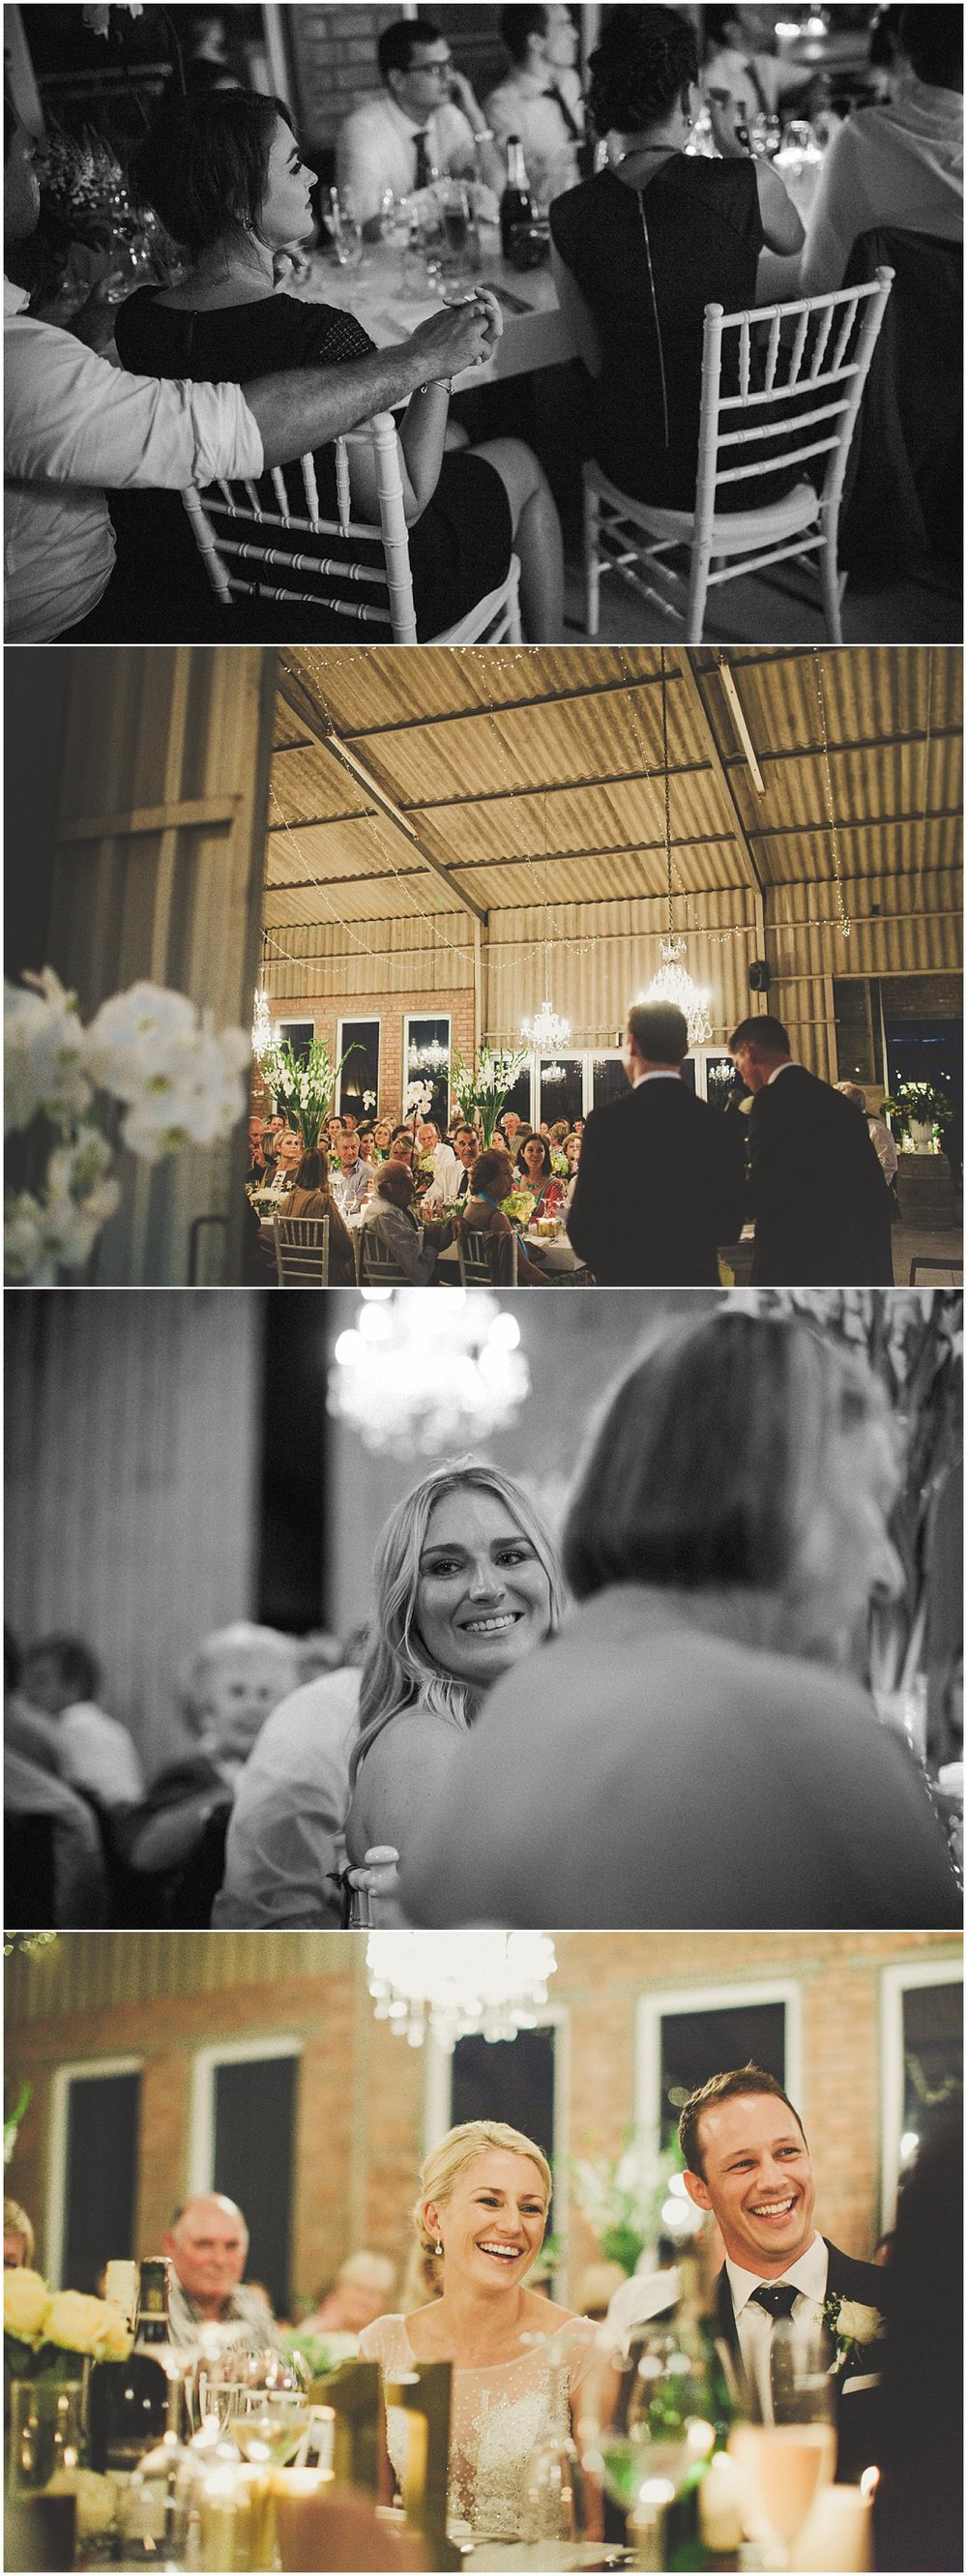 Laura&Chris_RoseBarn_Fionaclairphotography-284.jpg